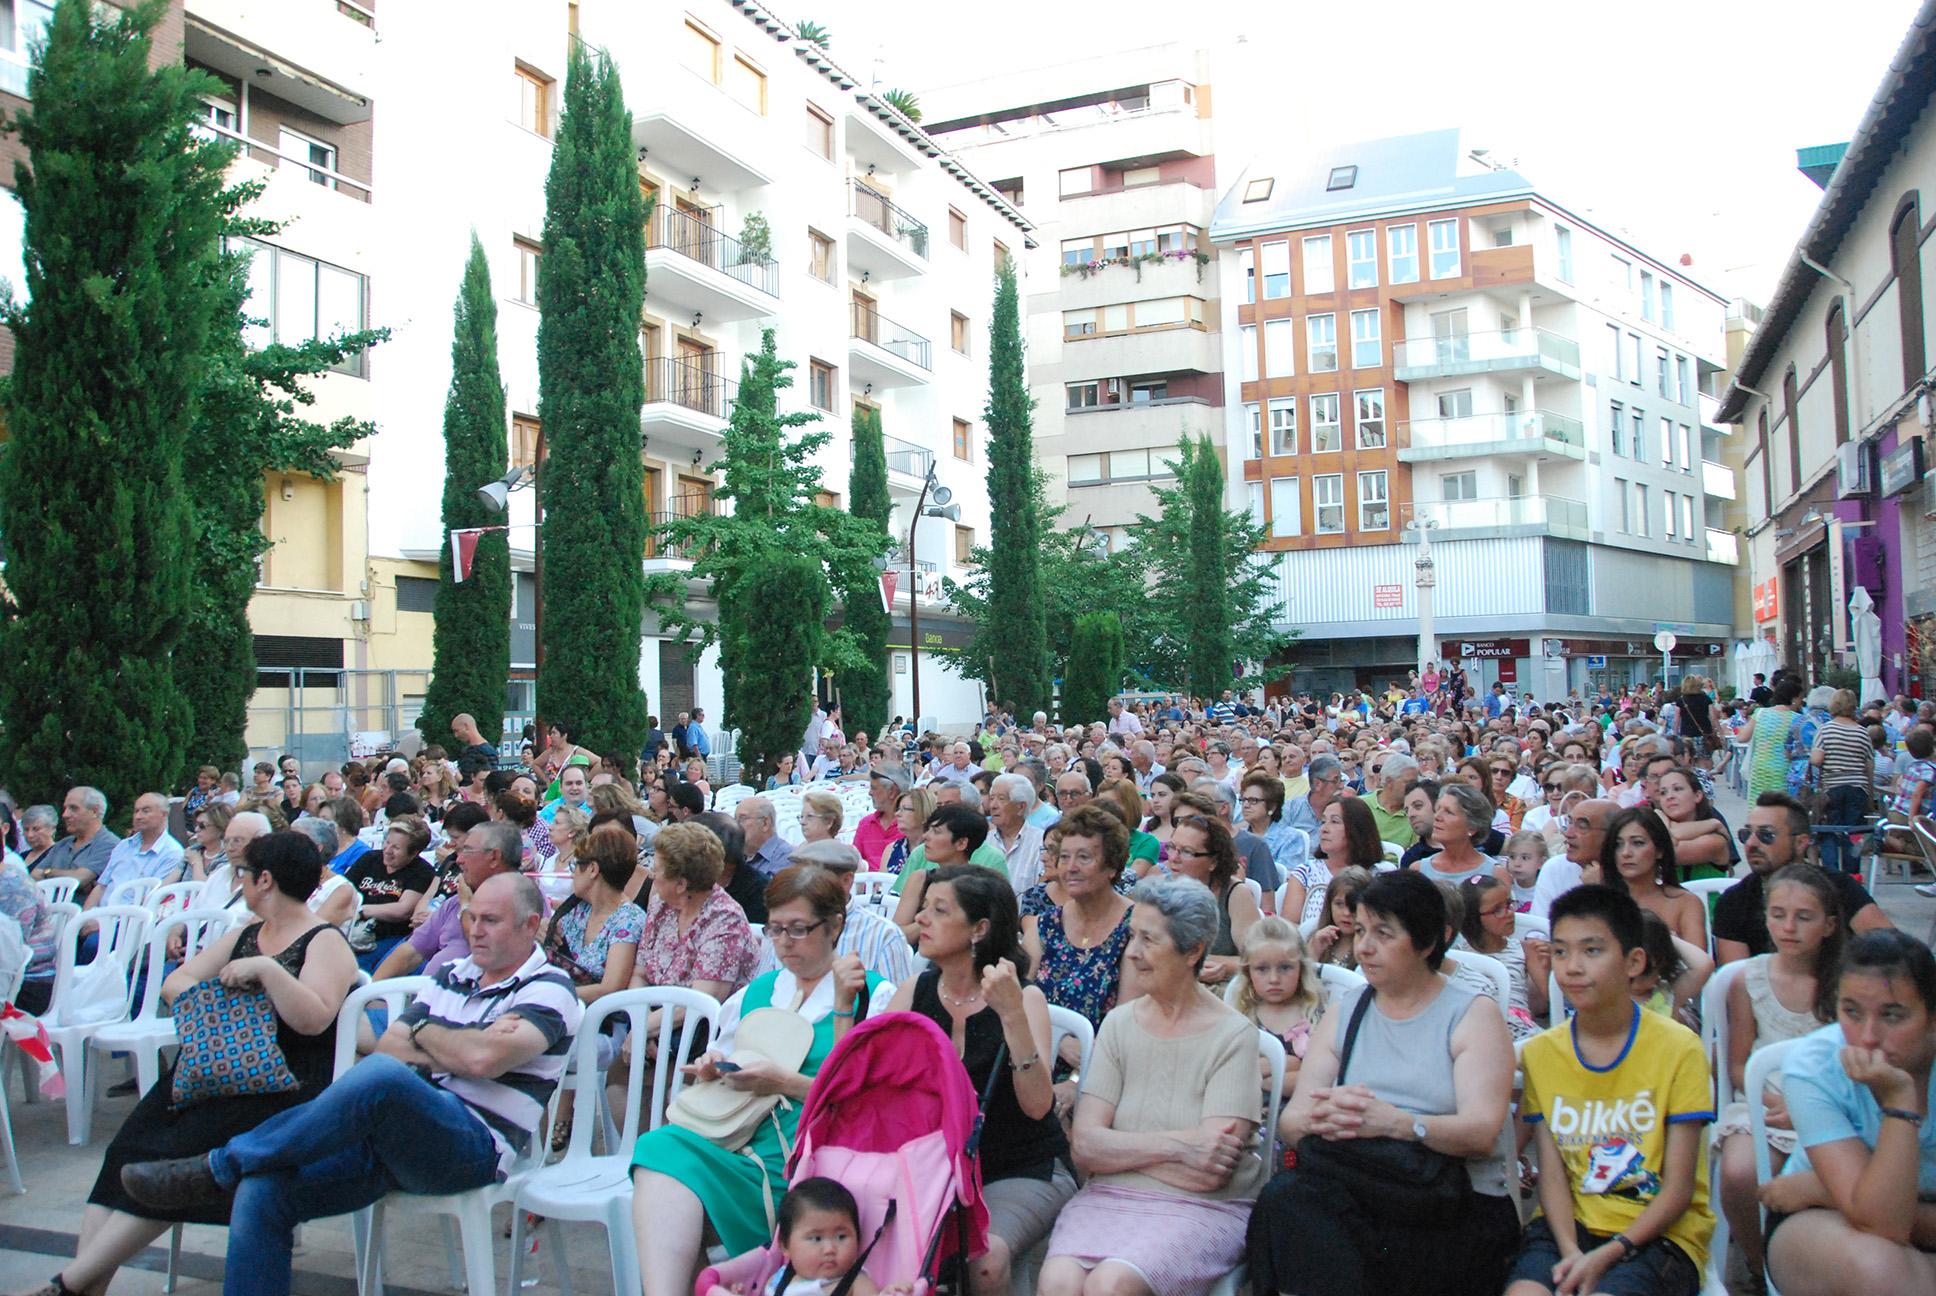 Baladre-FestaMajorDenia 07-07-2013 (79)